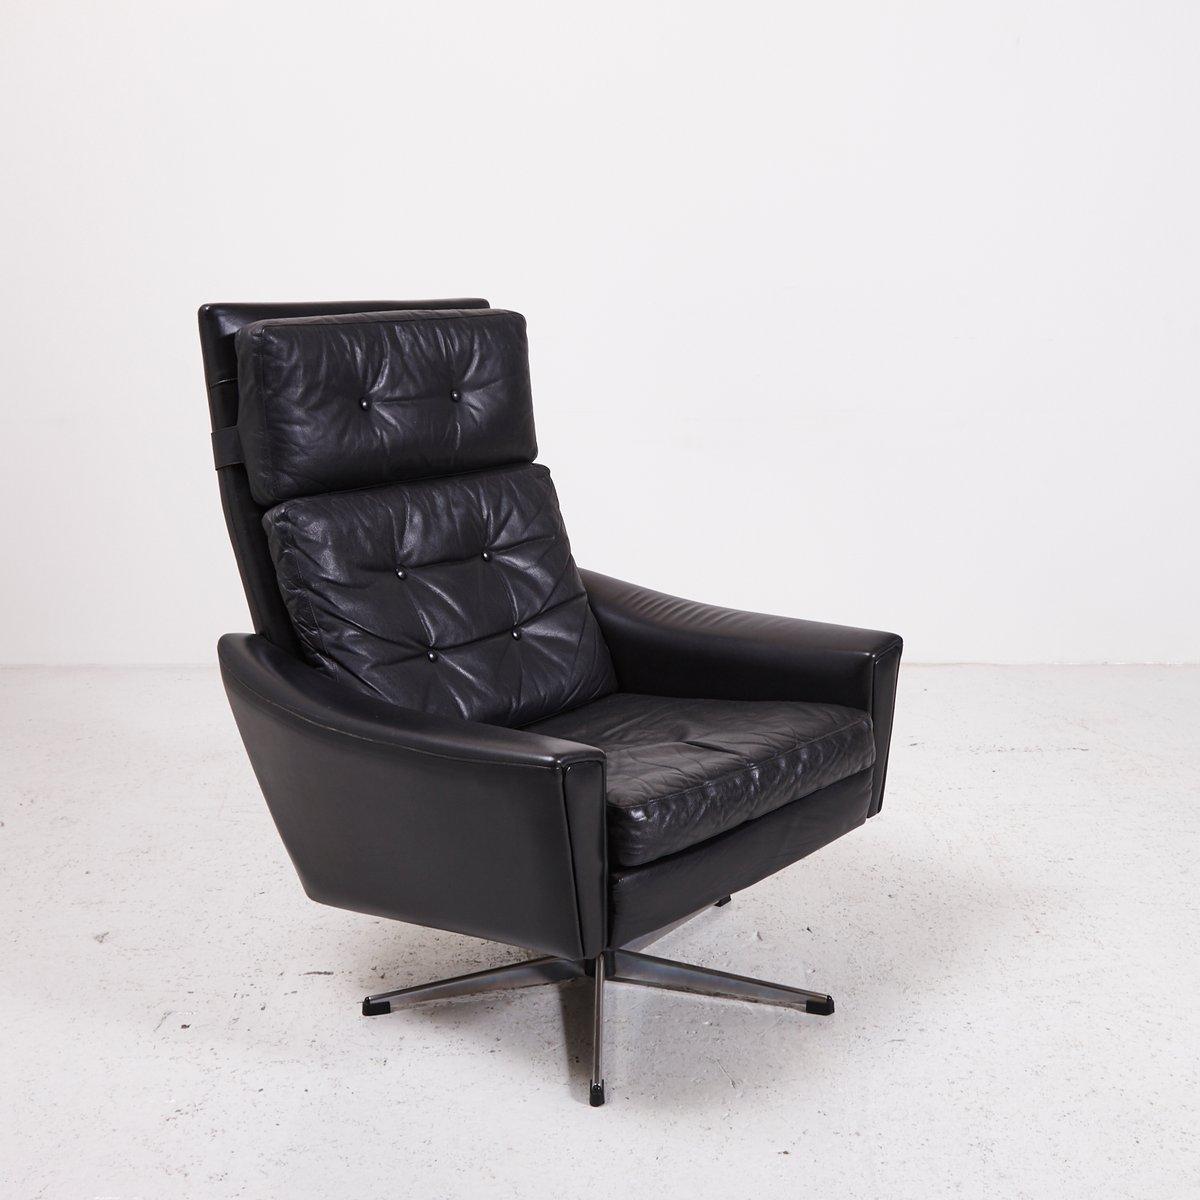 schwarzer drehsessel aus leder mit fu in sternenform 1970er bei pamono kaufen. Black Bedroom Furniture Sets. Home Design Ideas